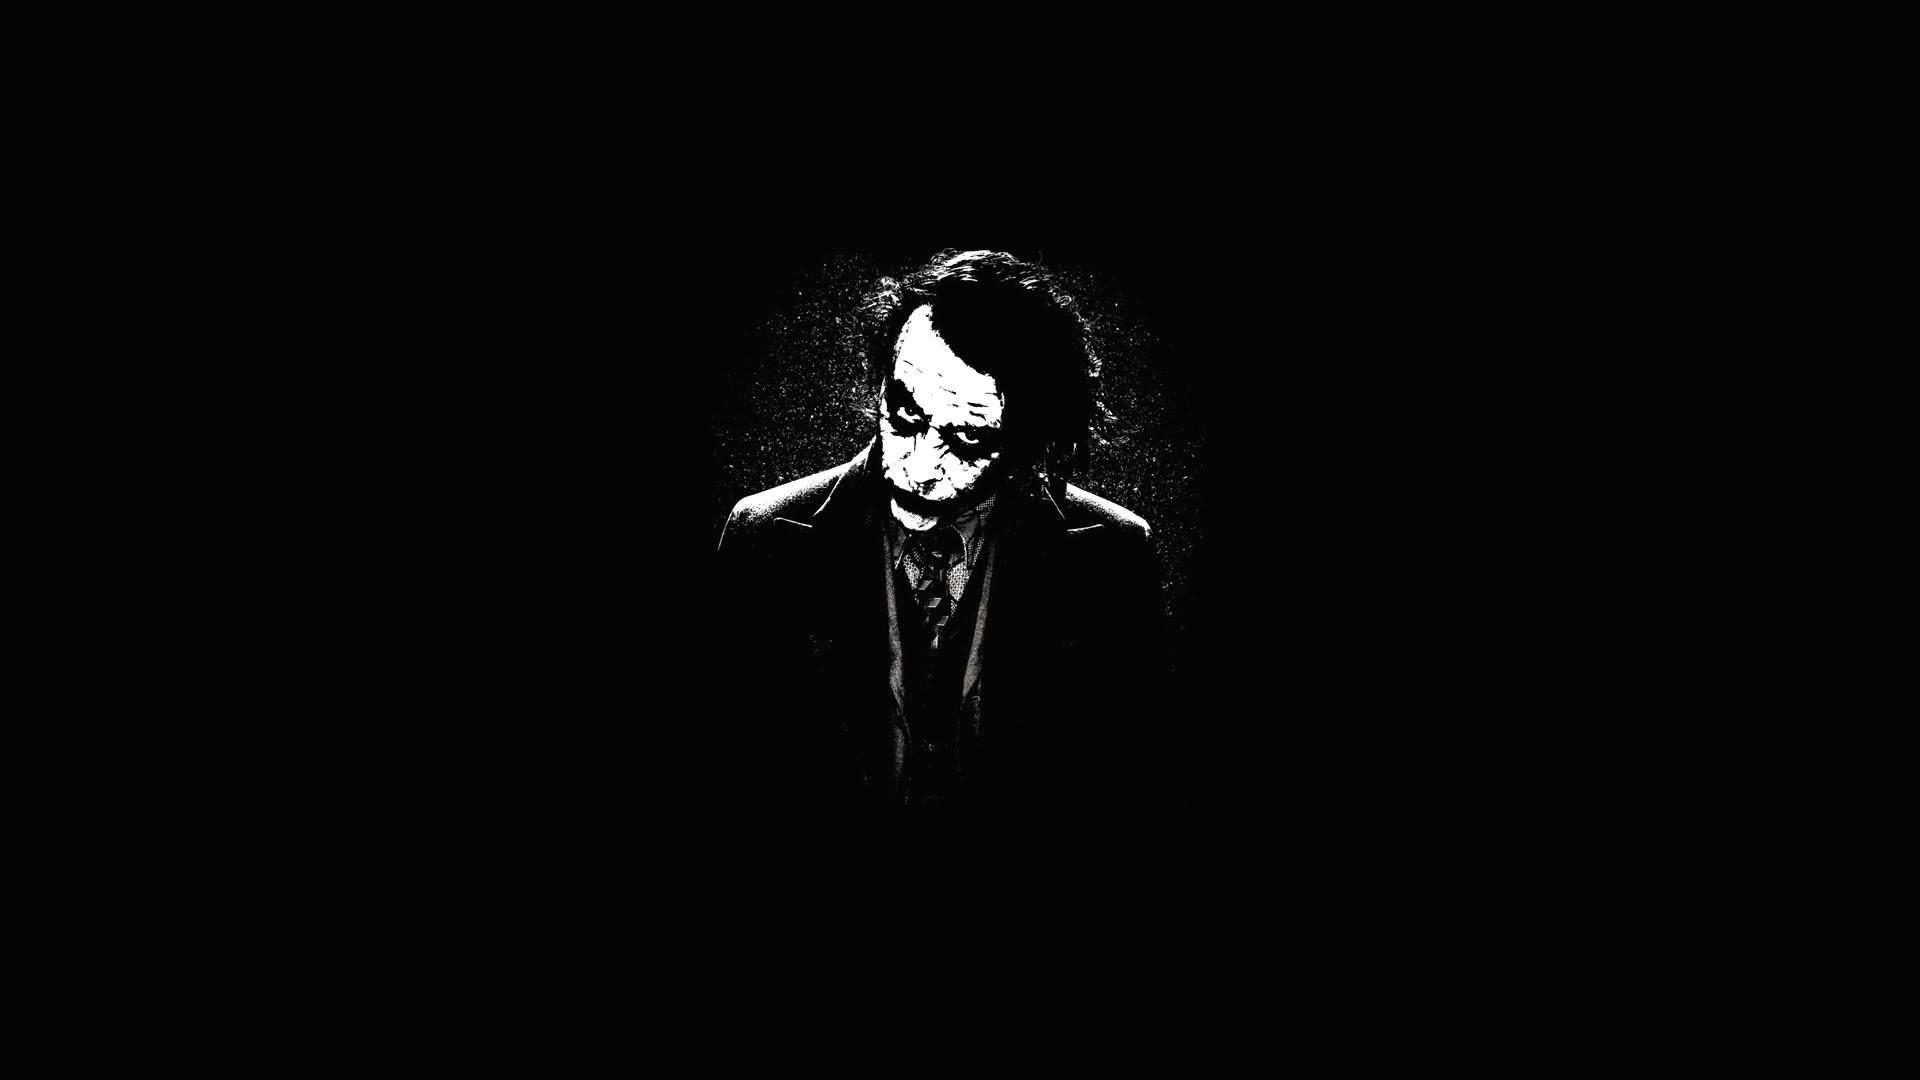 Joker Cartoon HD Desktop Wallpaper | HD Desktop Wallpaper